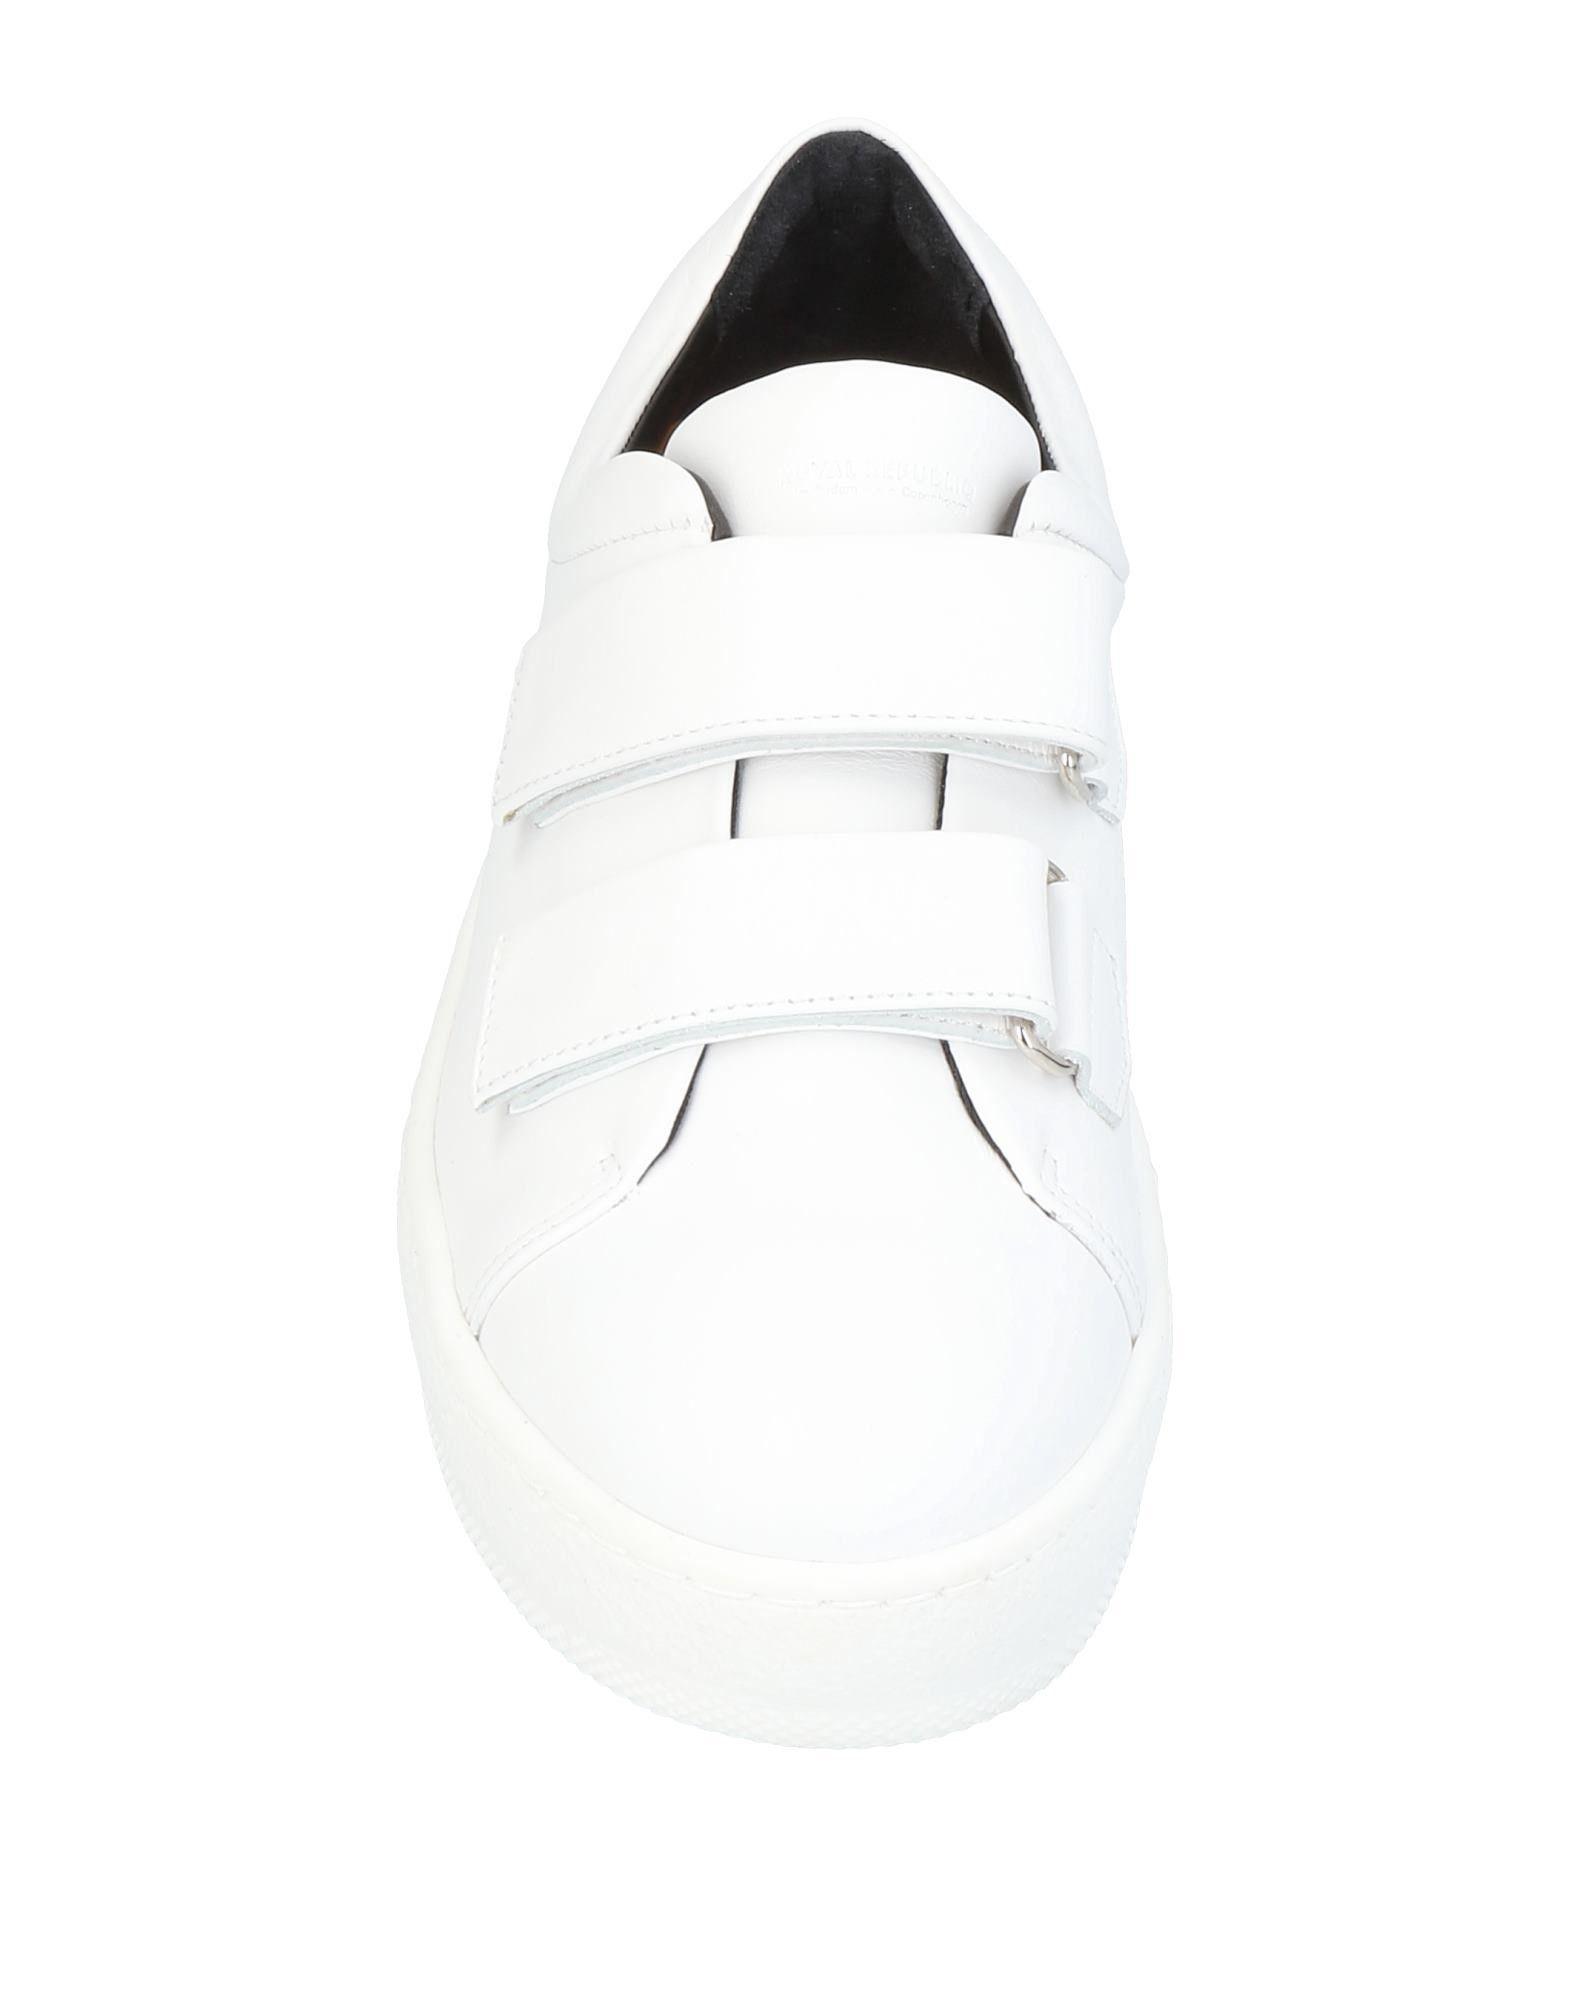 Stilvolle billige Schuhe Royal Republiq 11416839JQ Sneakers Damen  11416839JQ Republiq c835b4